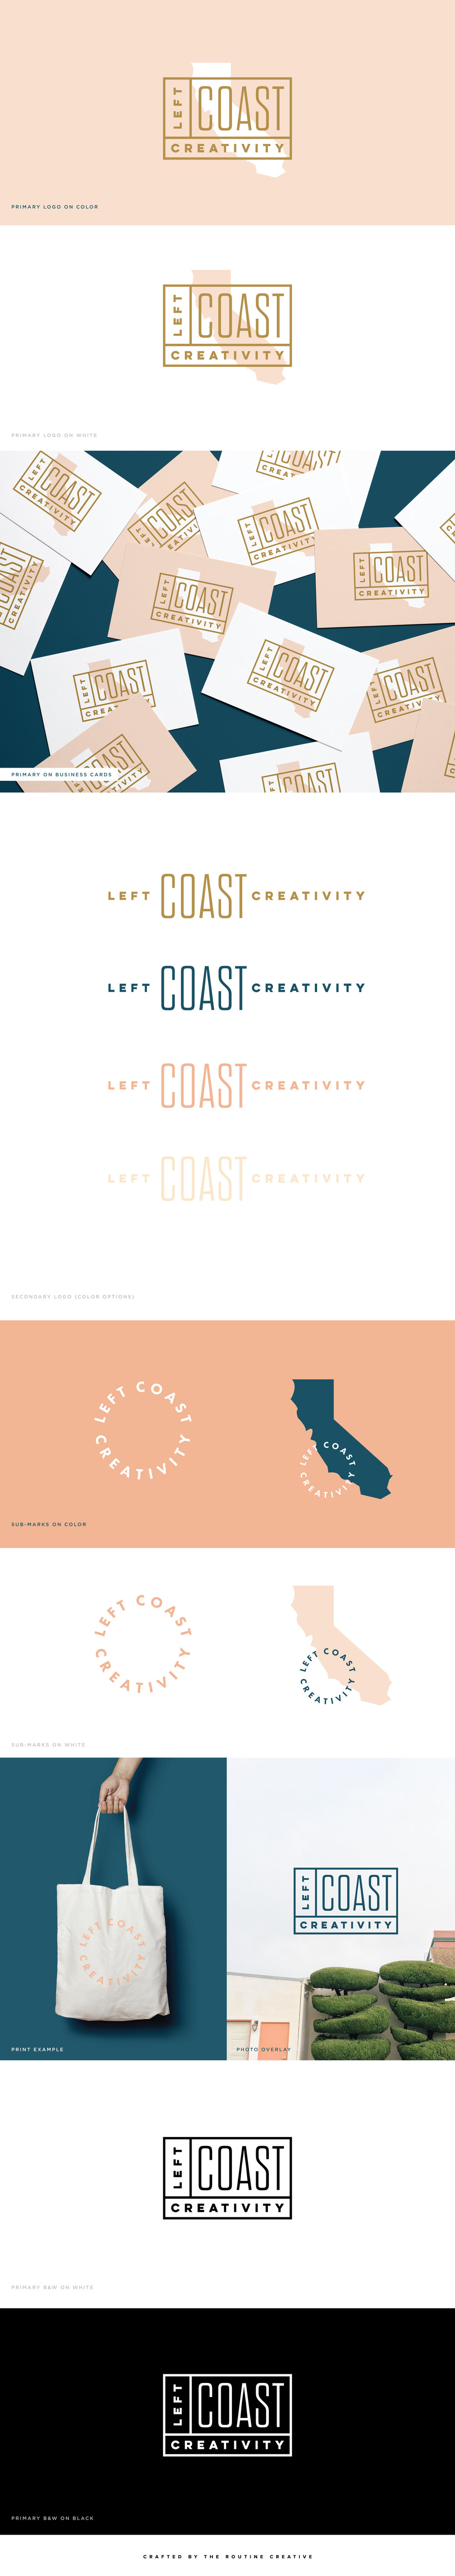 Left-Coast-Concept-3.jpg